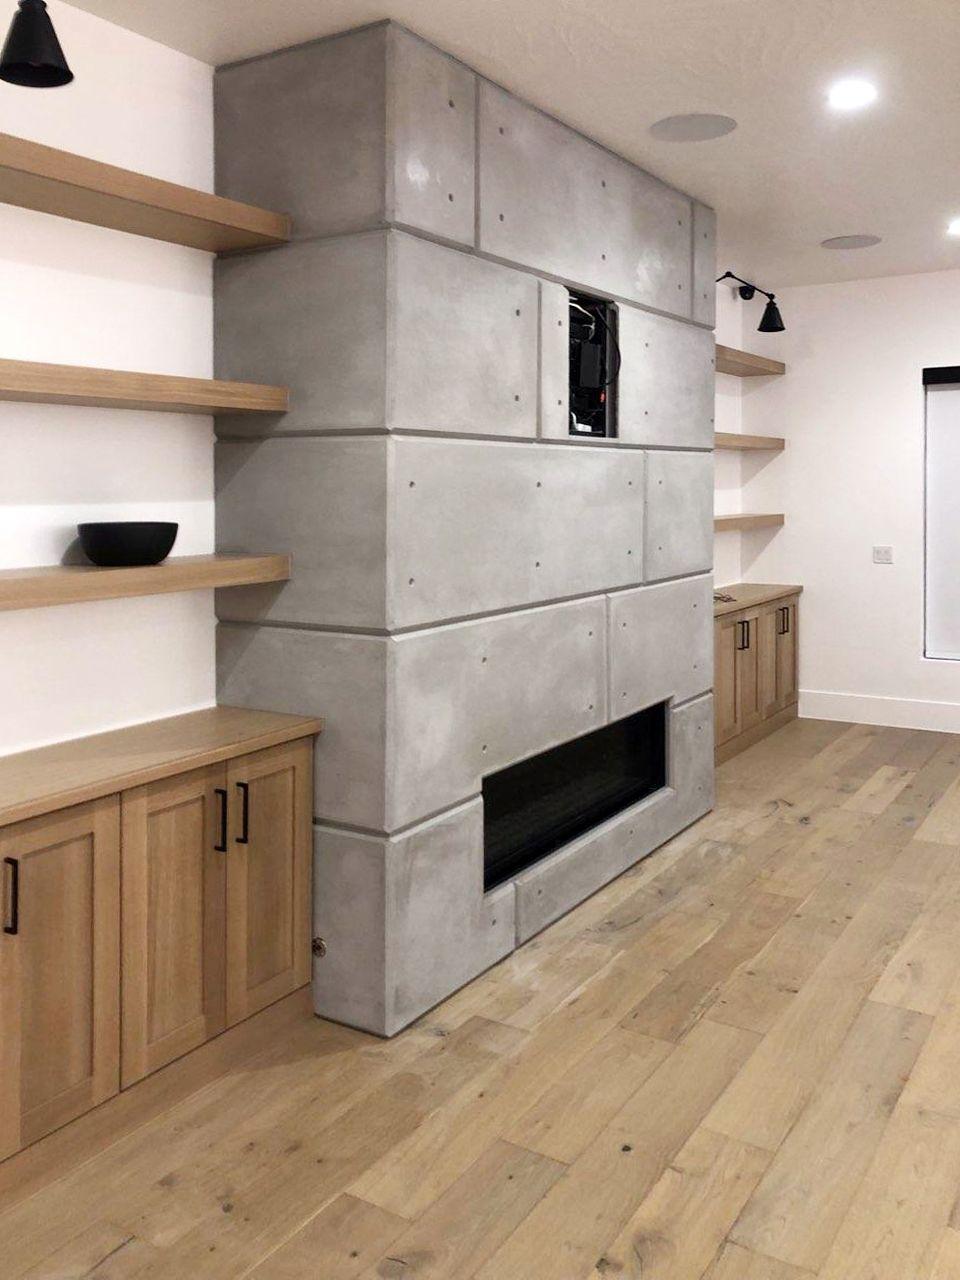 Contemporary Concrete Panel Fireplace Surround In 2020 Fireplace Building A House Fireplace Surrounds